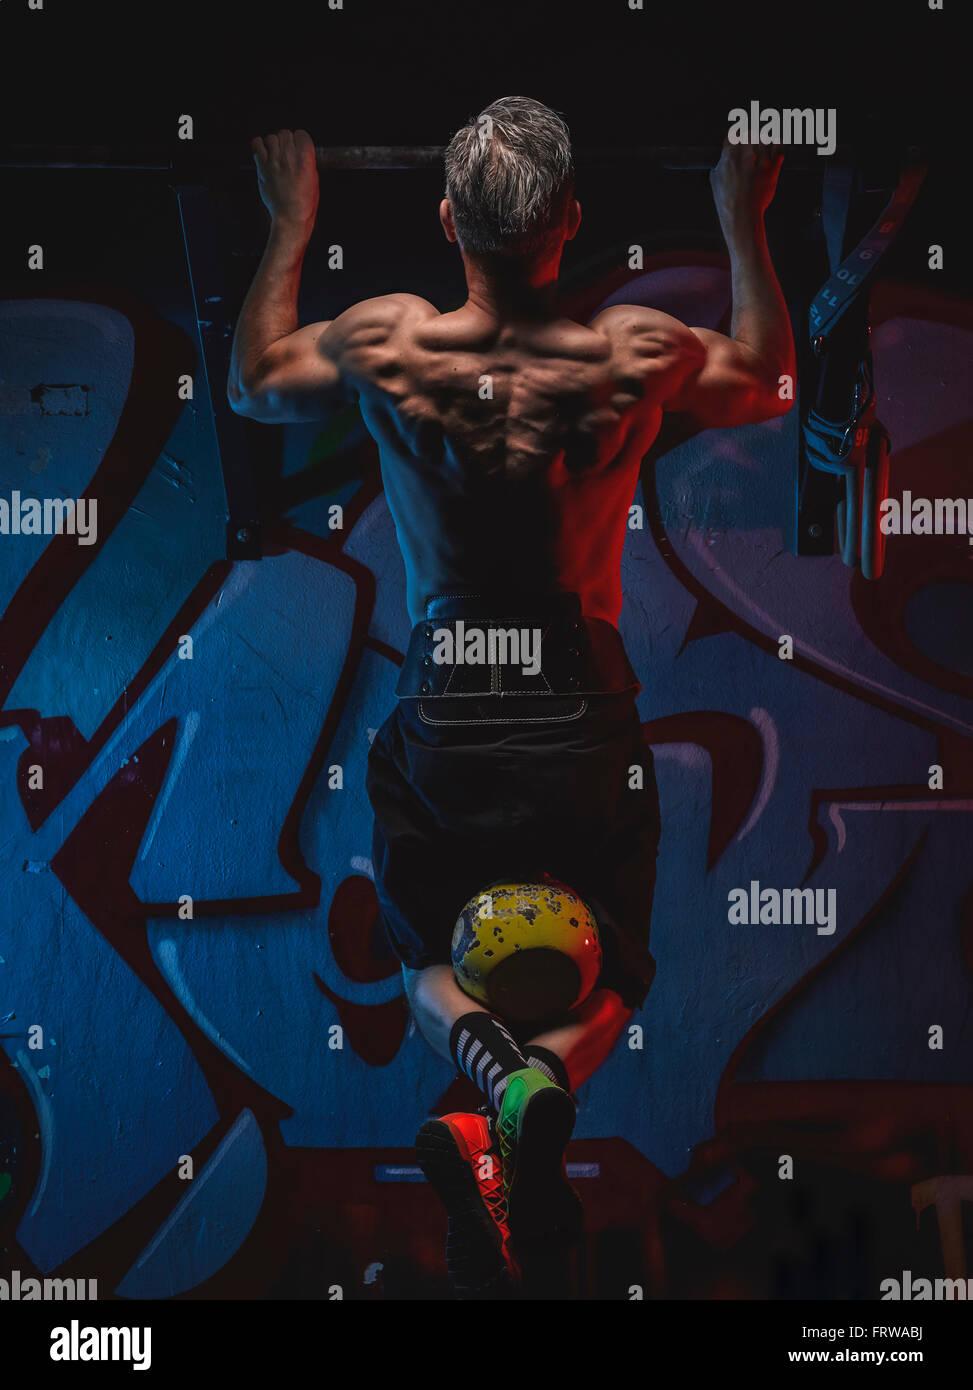 Athlète crossfit mature faisant chin-ups avec kettlebell Photo Stock